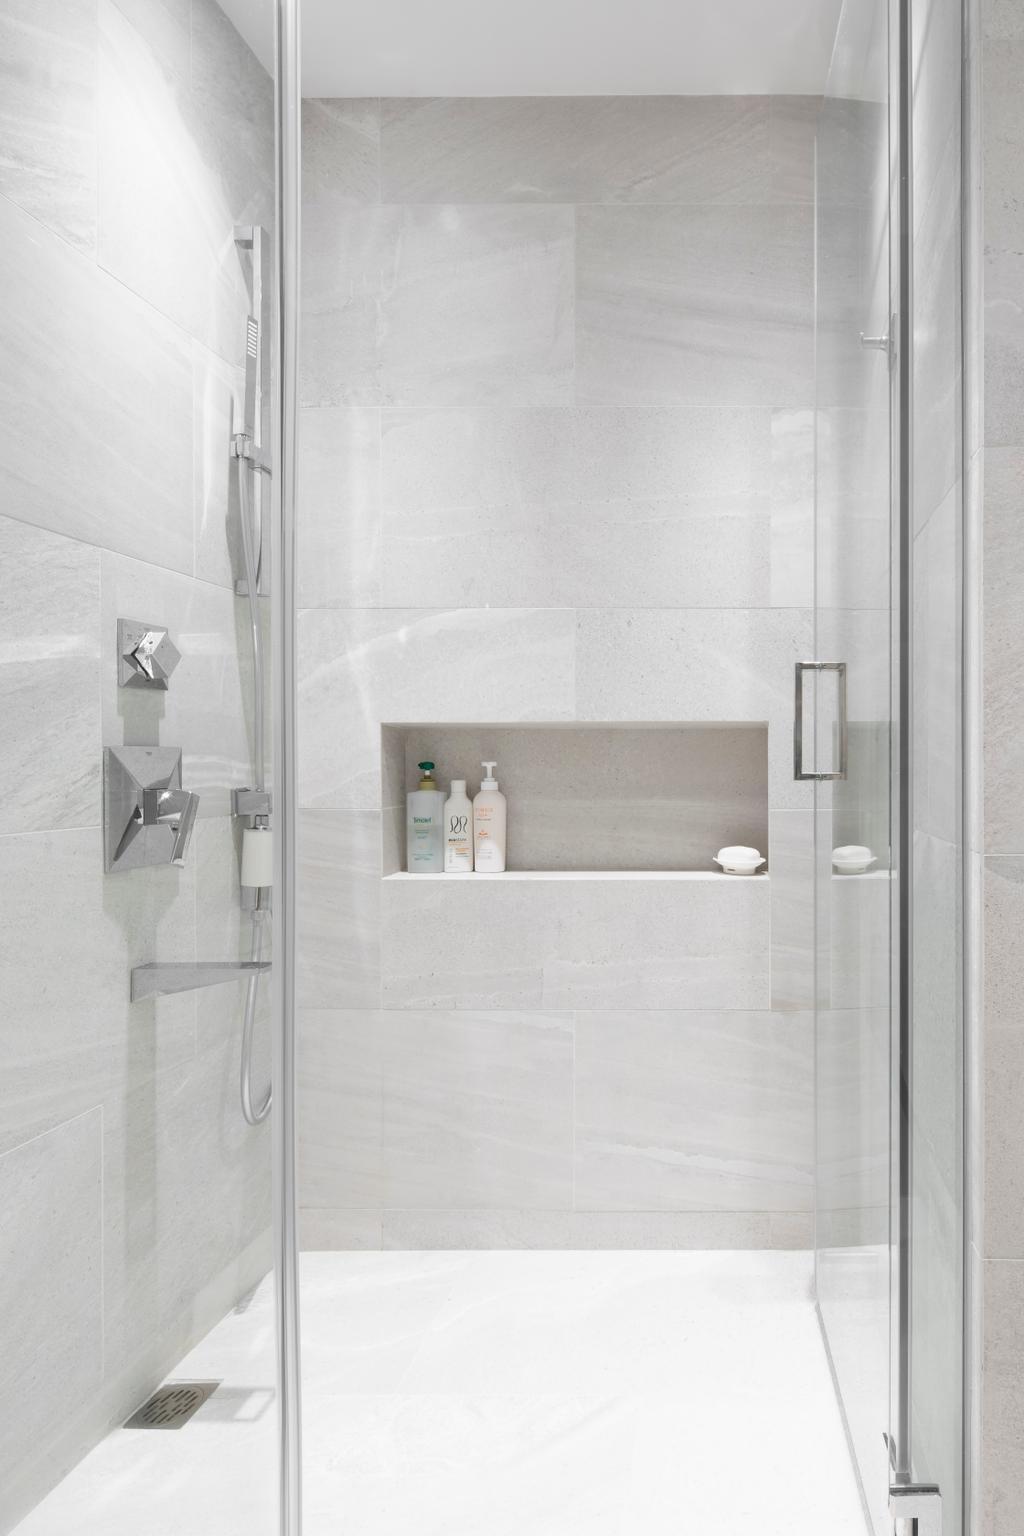 私家樓, 浴室, 雅柏苑, 室內設計師, Ash Studio